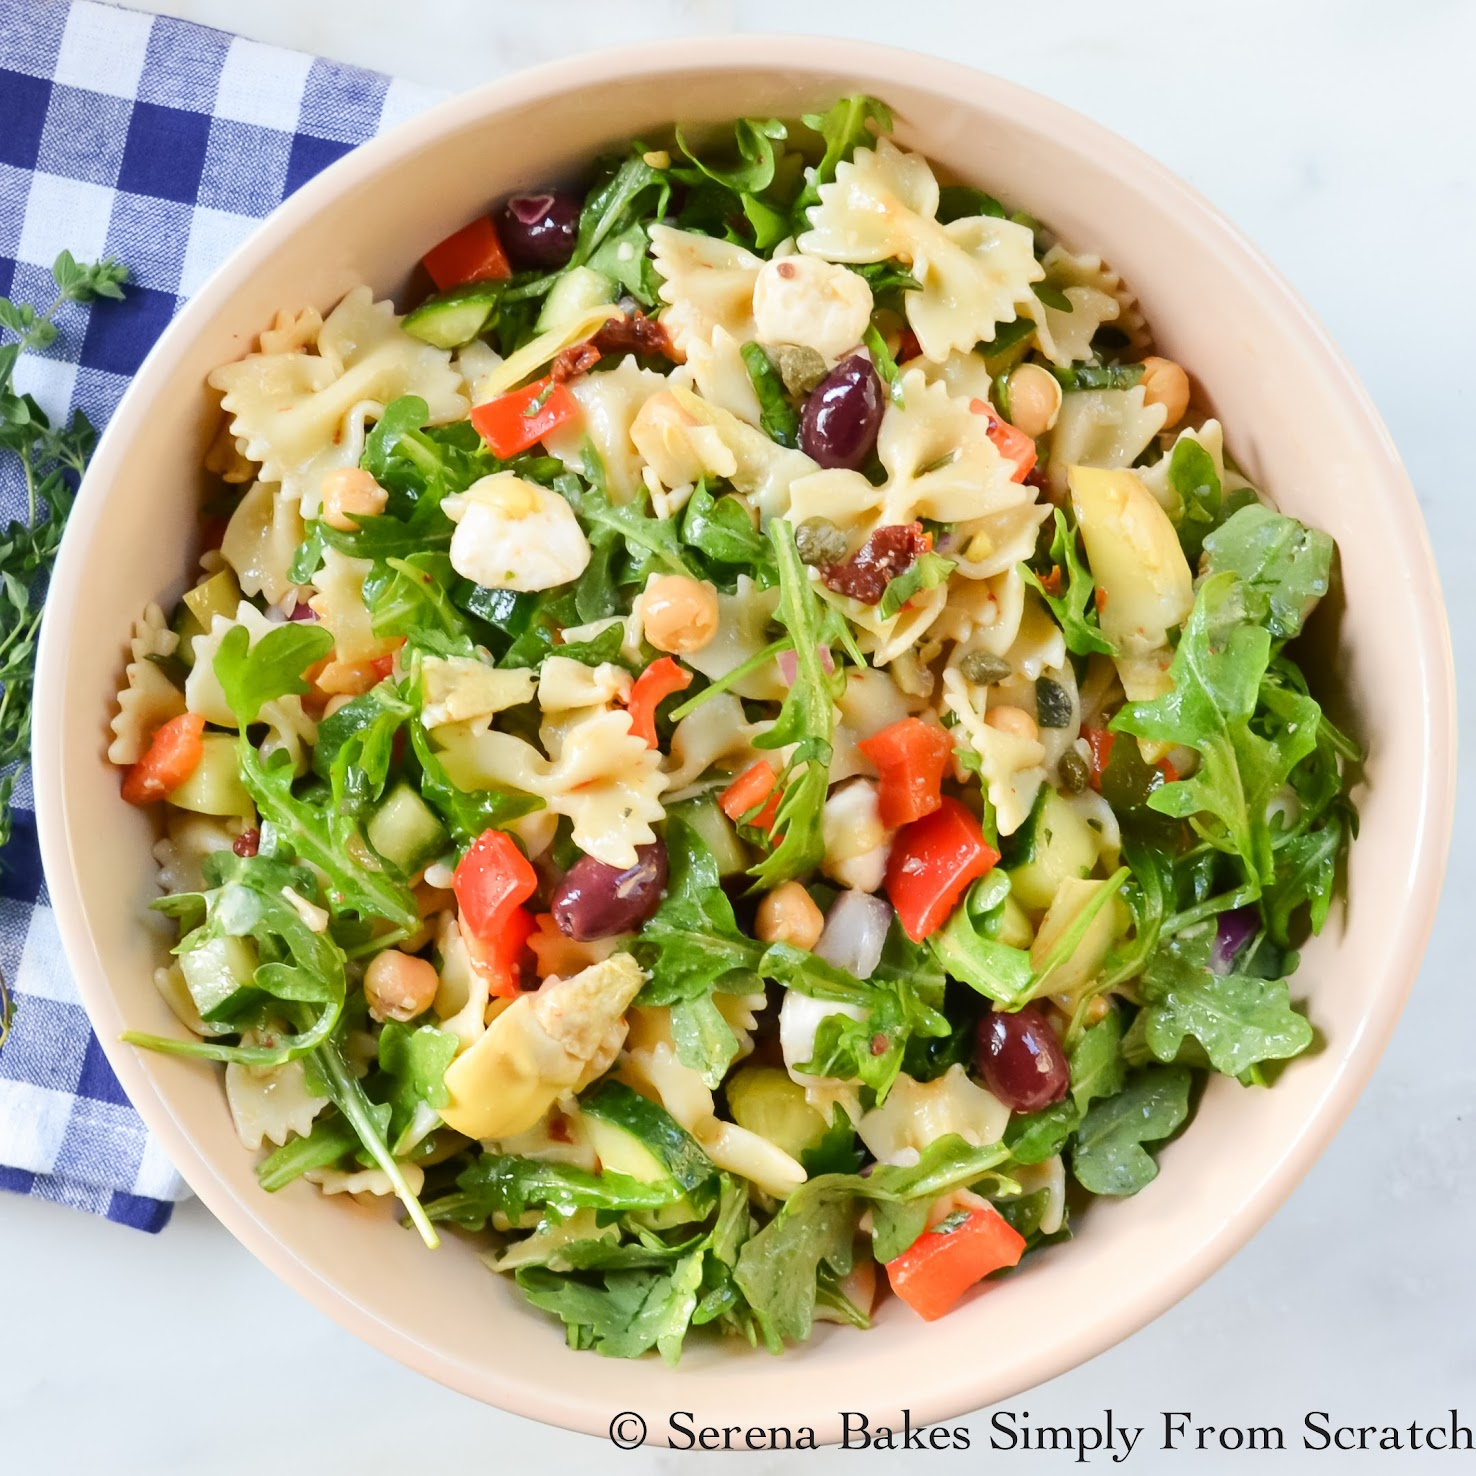 Mediterranean Pasta Salad is the perfect dish for picnics, potlucks and road trips!